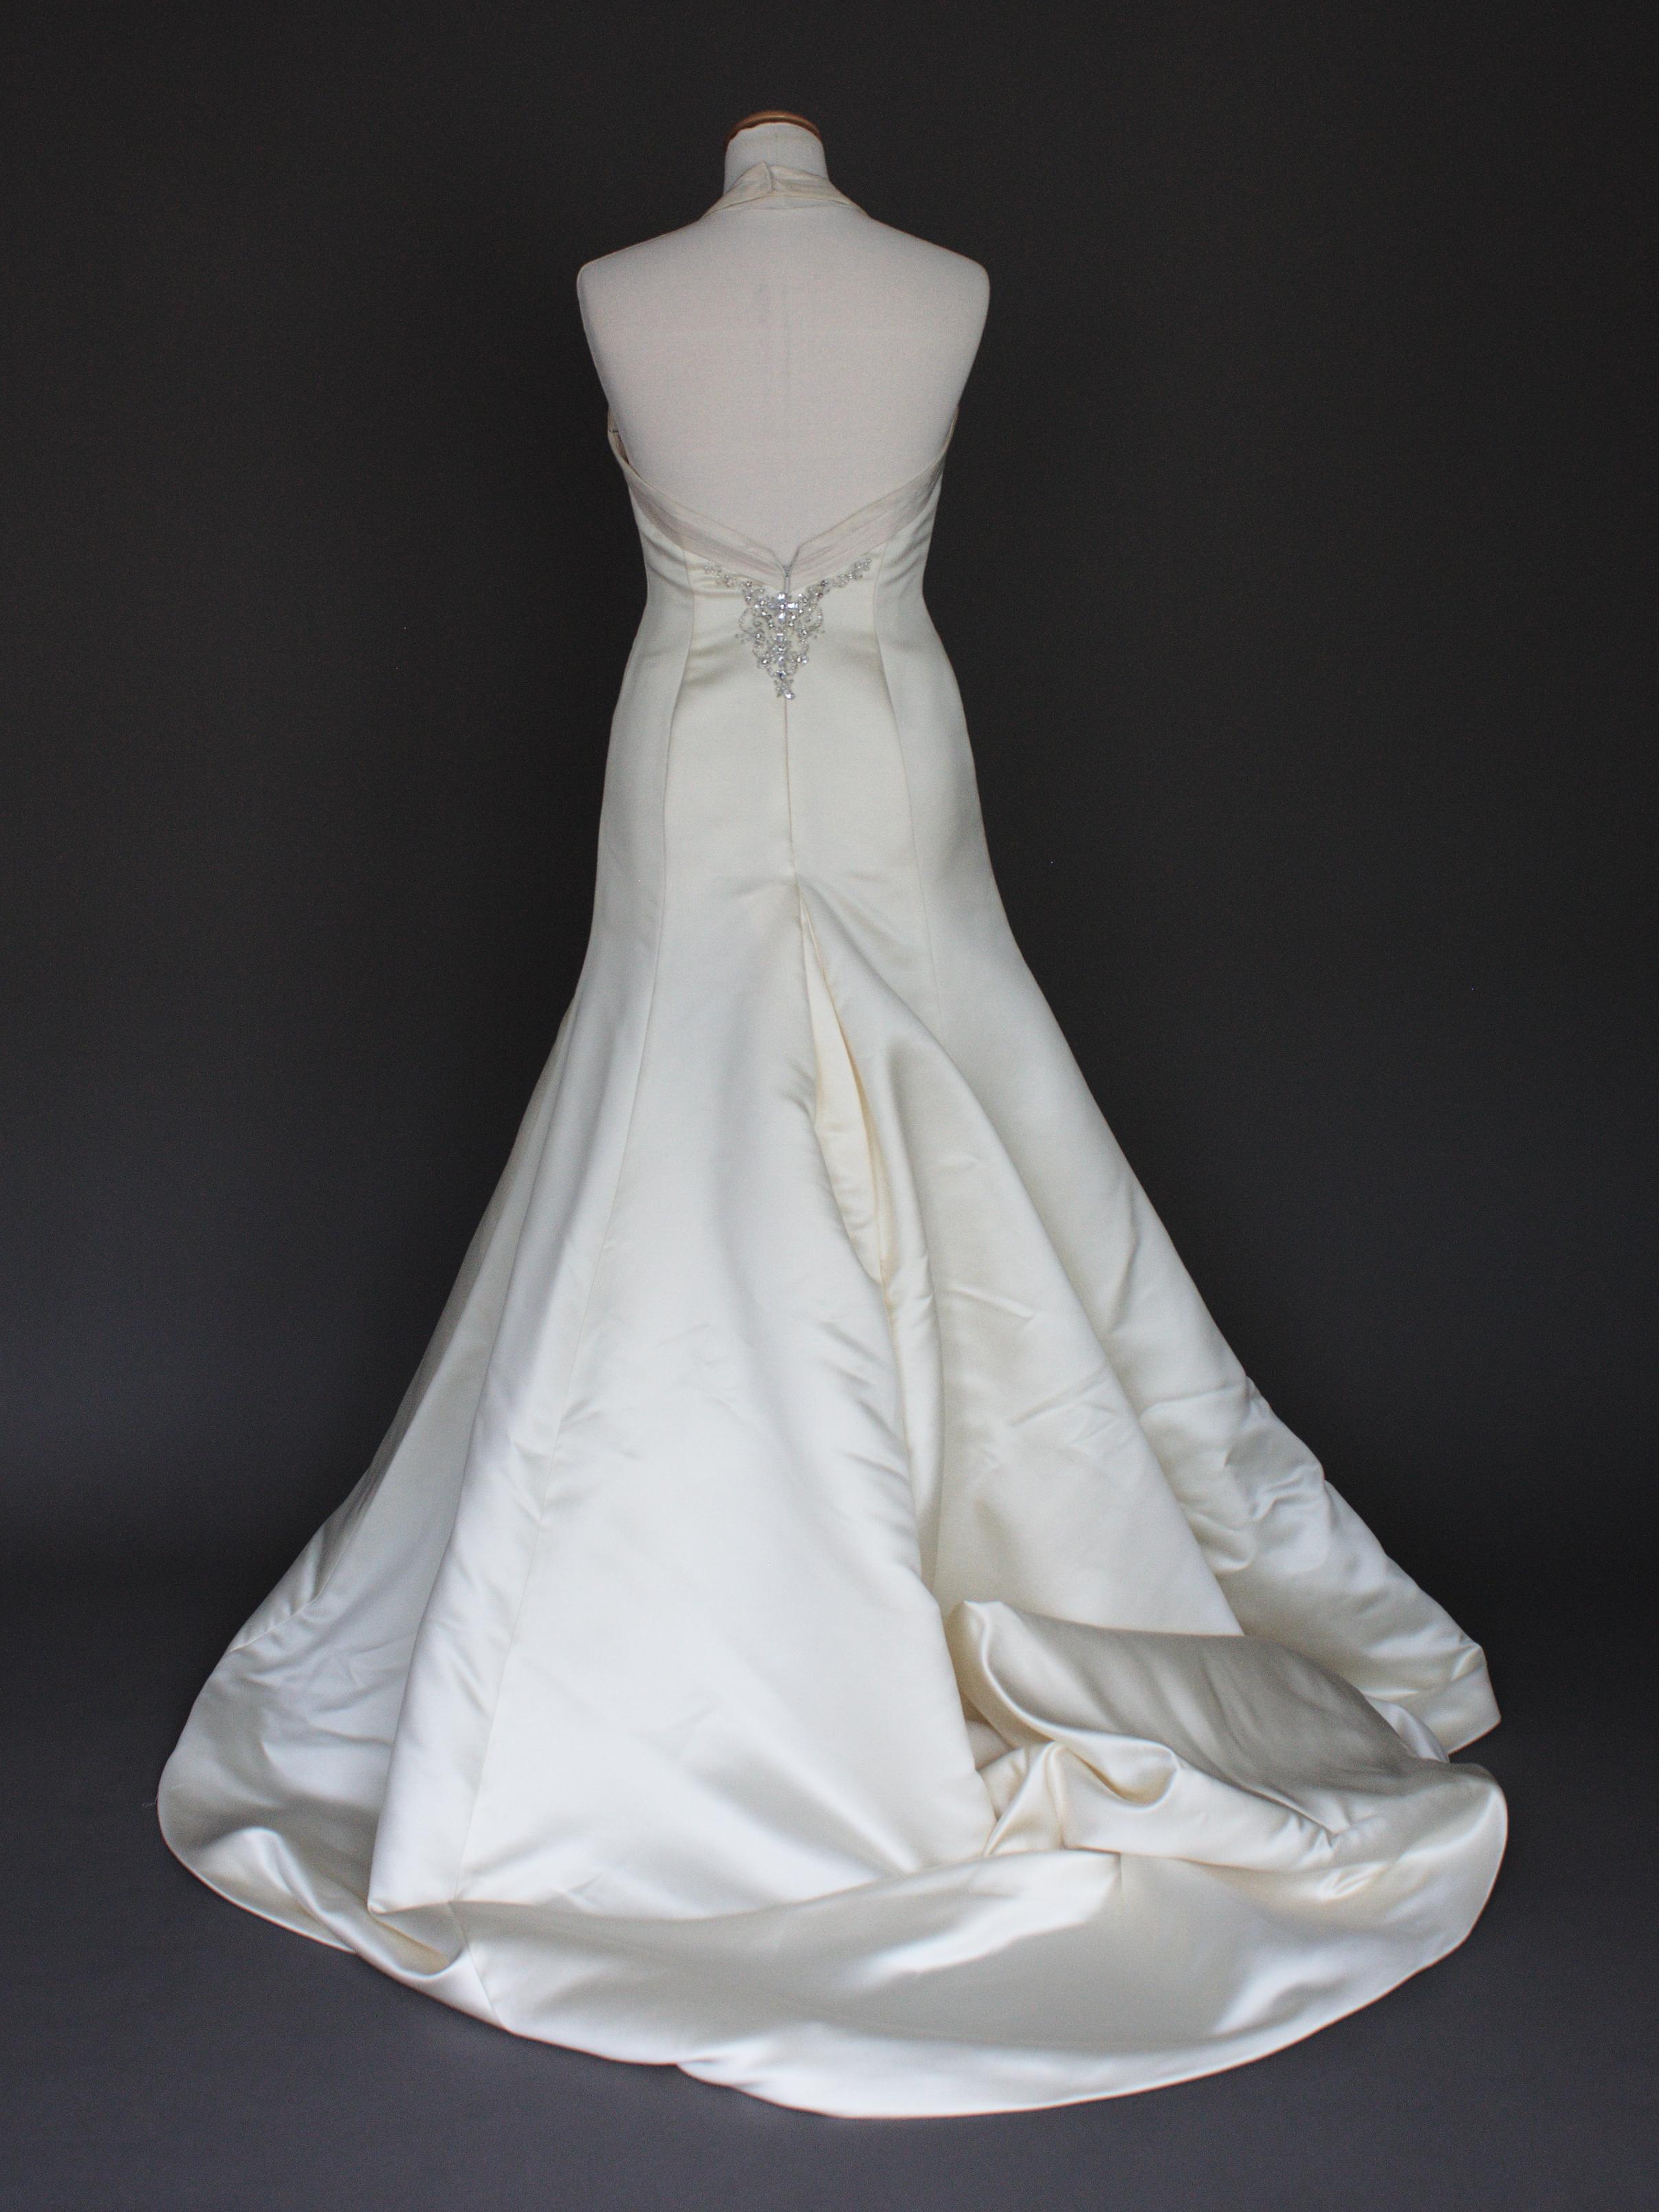 acheter une robe de mariee d occasion. Black Bedroom Furniture Sets. Home Design Ideas